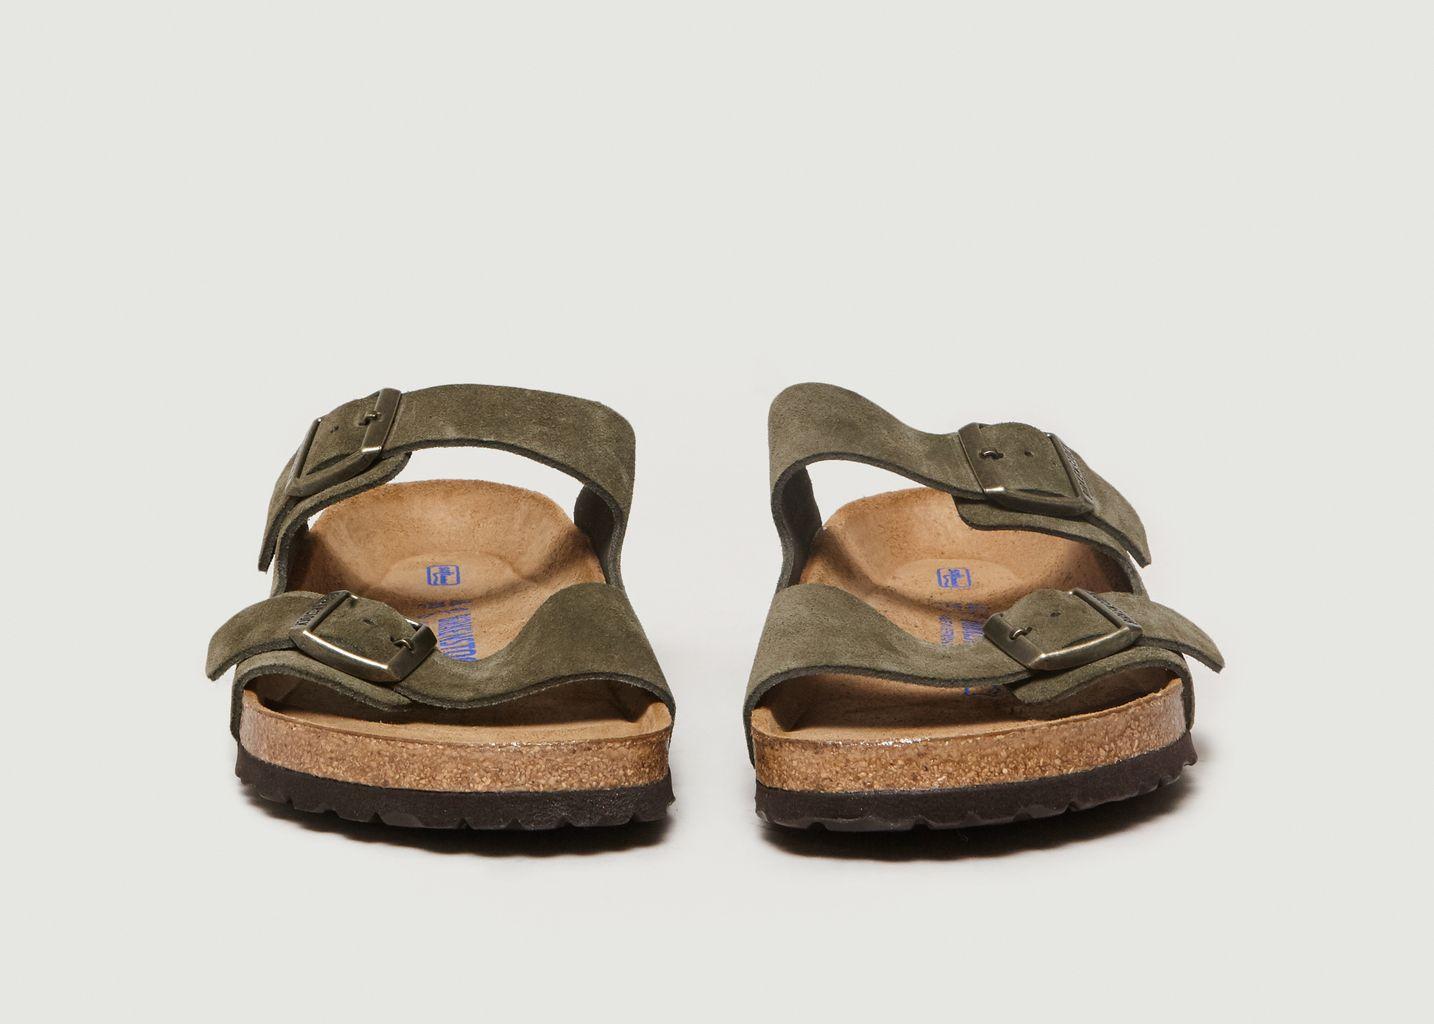 Sausalito Paris Les sandales Birkenstock sont | Facebook